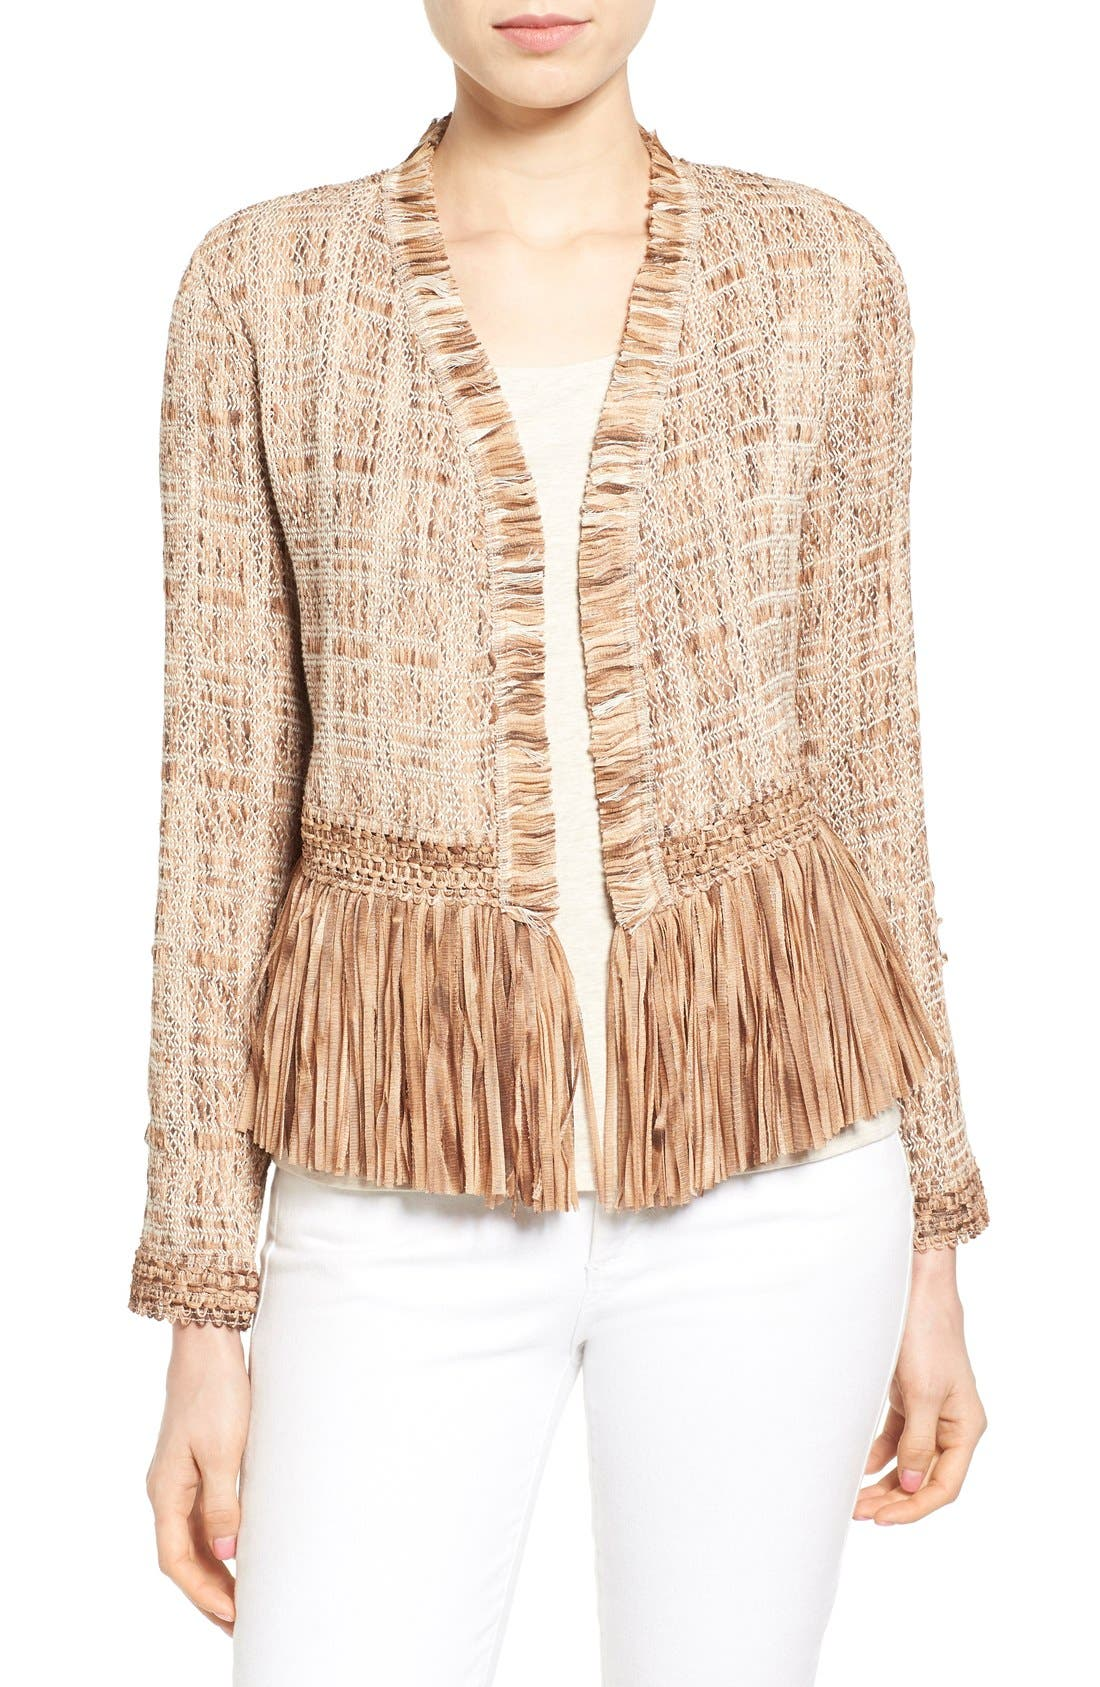 Main Image - NIC+ZOE 'Cork' Fringe Tweed Jacket (Regular & Petite)